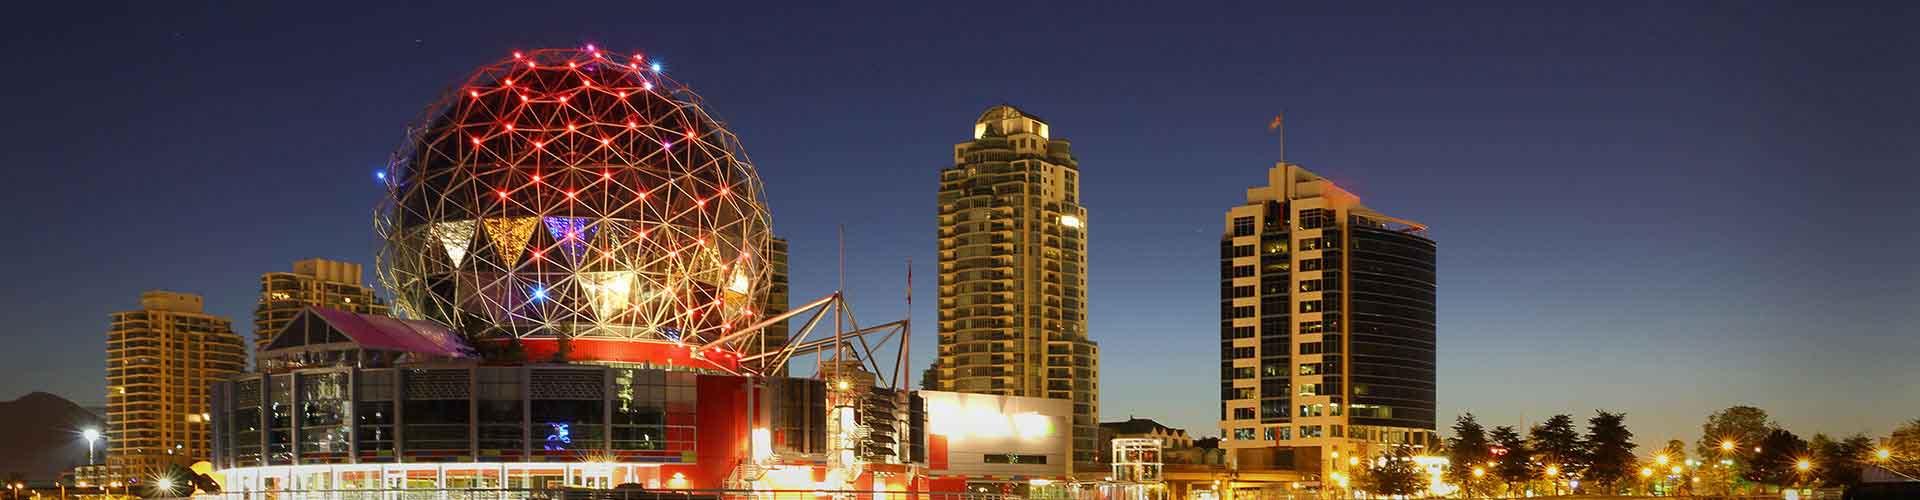 Vancouver - Hostele w mieście: Vancouver, Mapy: Vancouver, Zdjęcia i Recenzje dla każdego hostelu w mieście Vancouver.